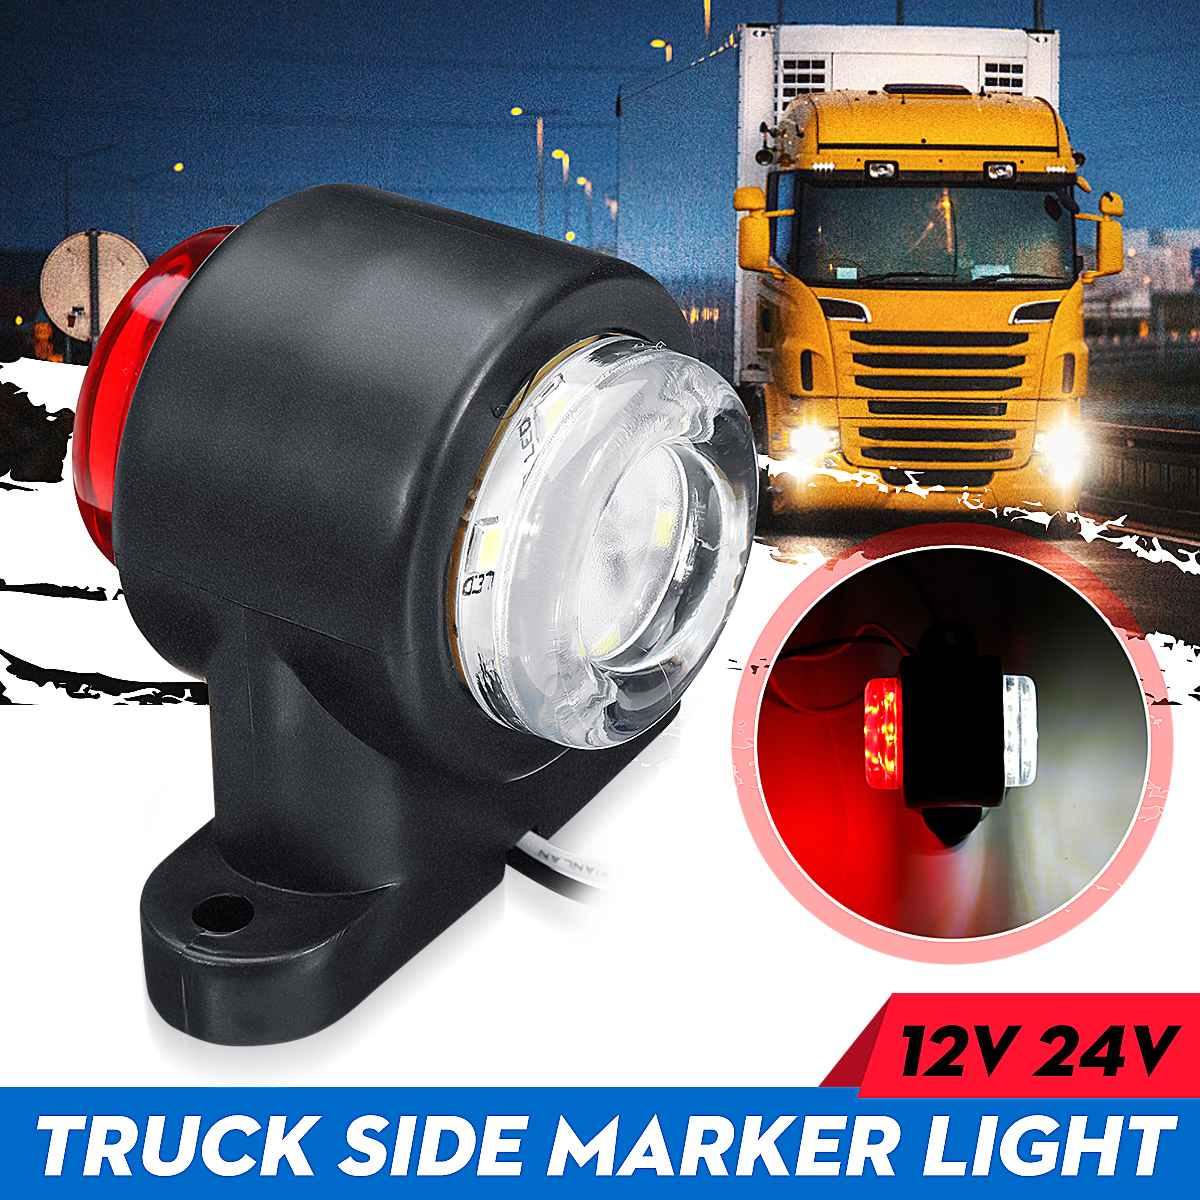 1Pc Single 10-30v 12 LED Universal Car Truck Side Marker Light Side Lights Indicator Lamp Red White For Camper Trailer Lorry RV